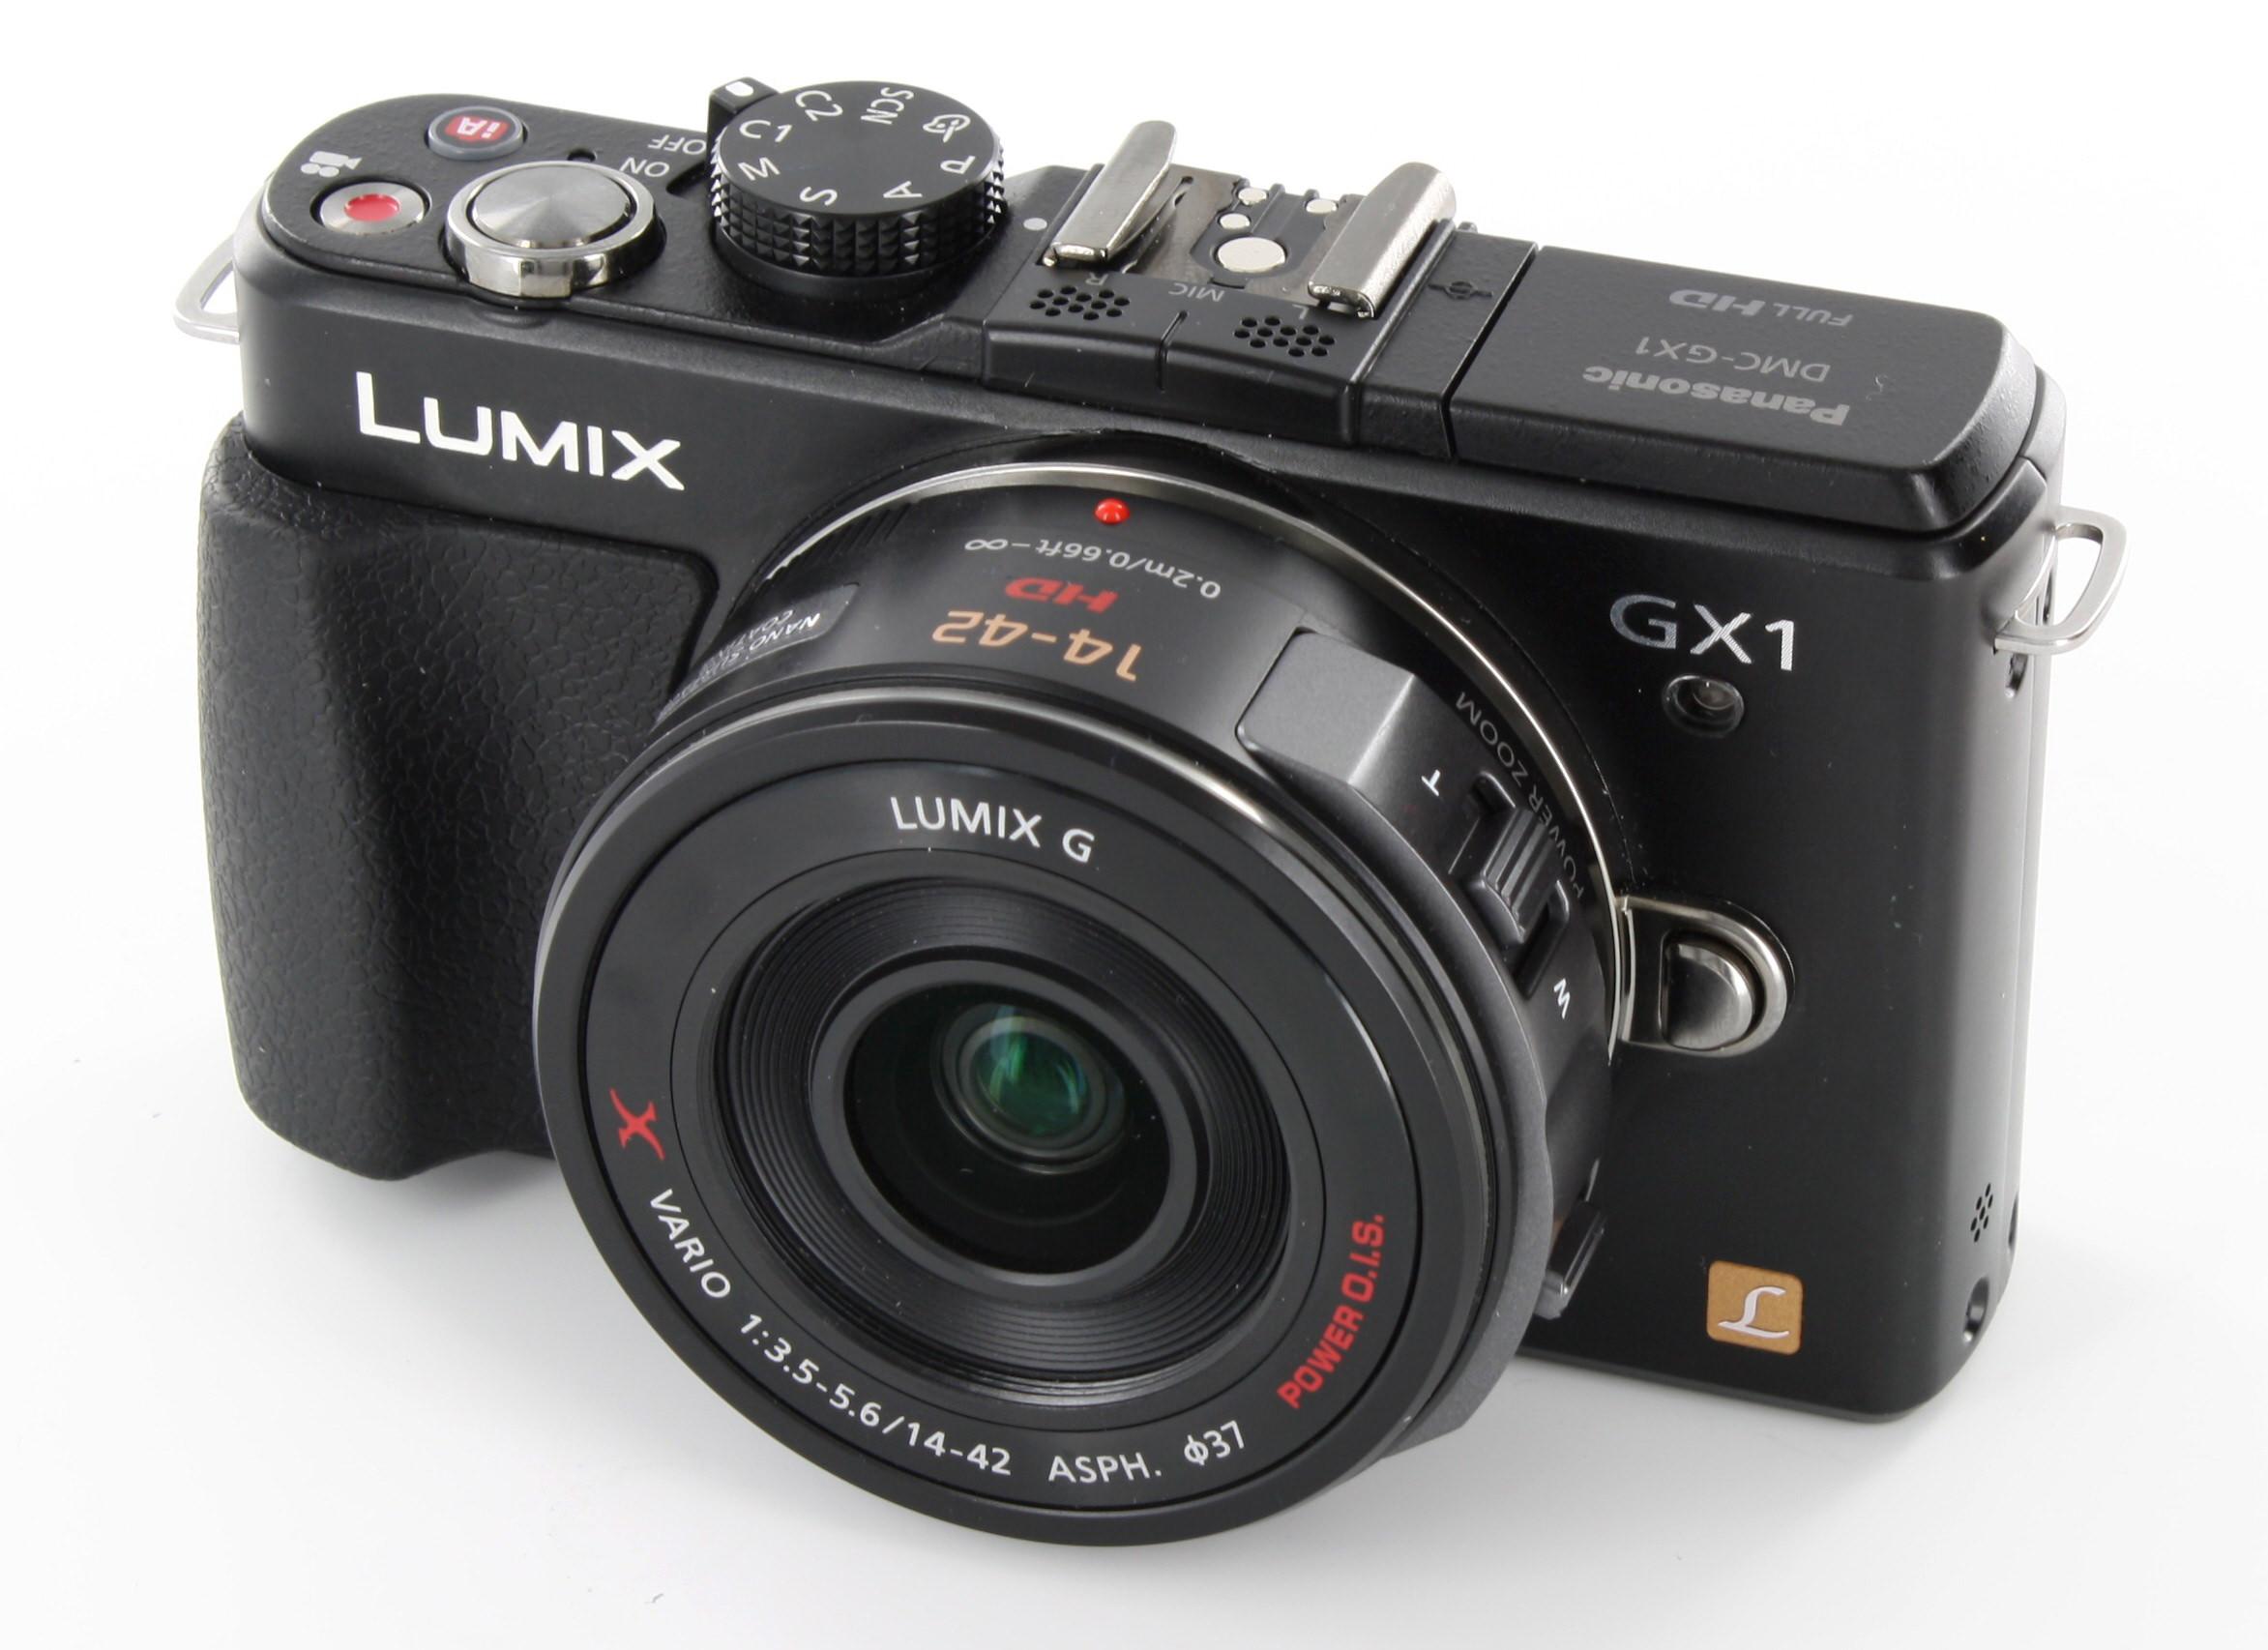 panasonic lumix dmc gx1 camera review rh ephotozine com Camera Digital Black Panasonic DMC-FZ20K Panasonic GH3